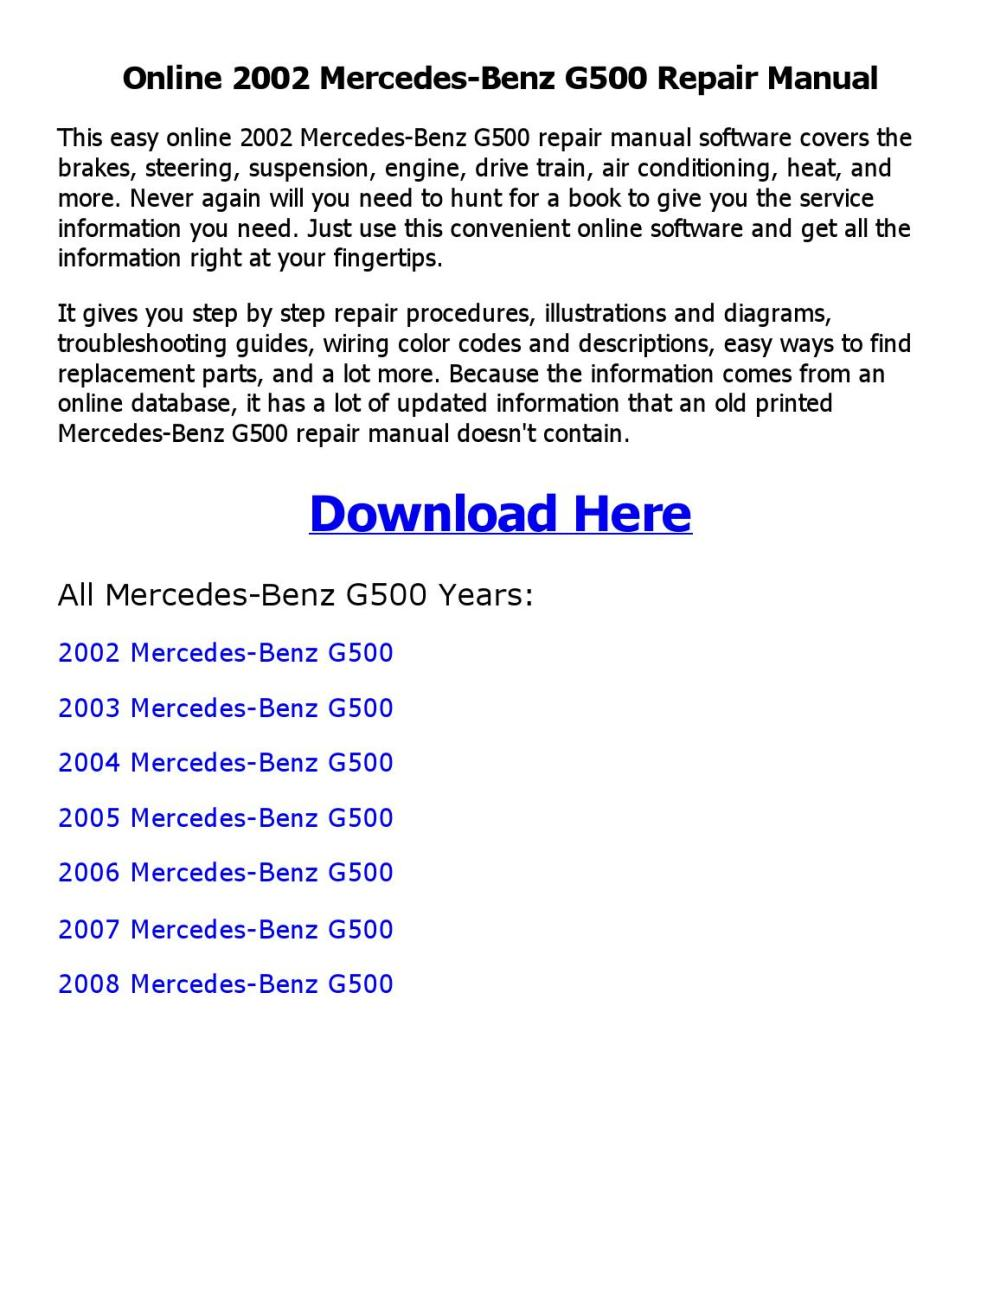 medium resolution of 2002 mercedes benz g500 repair manual online